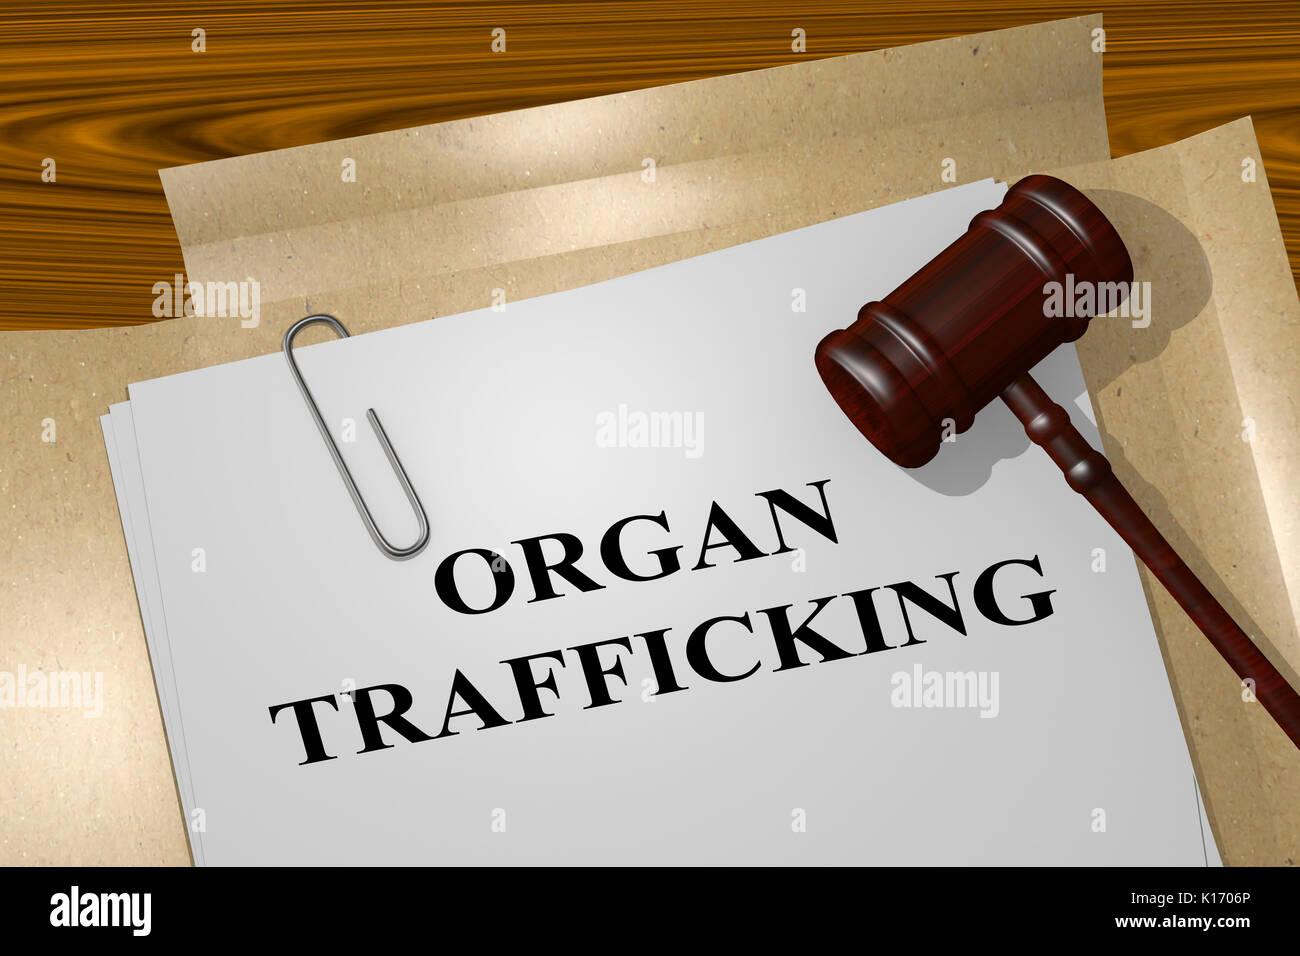 organ sale legality